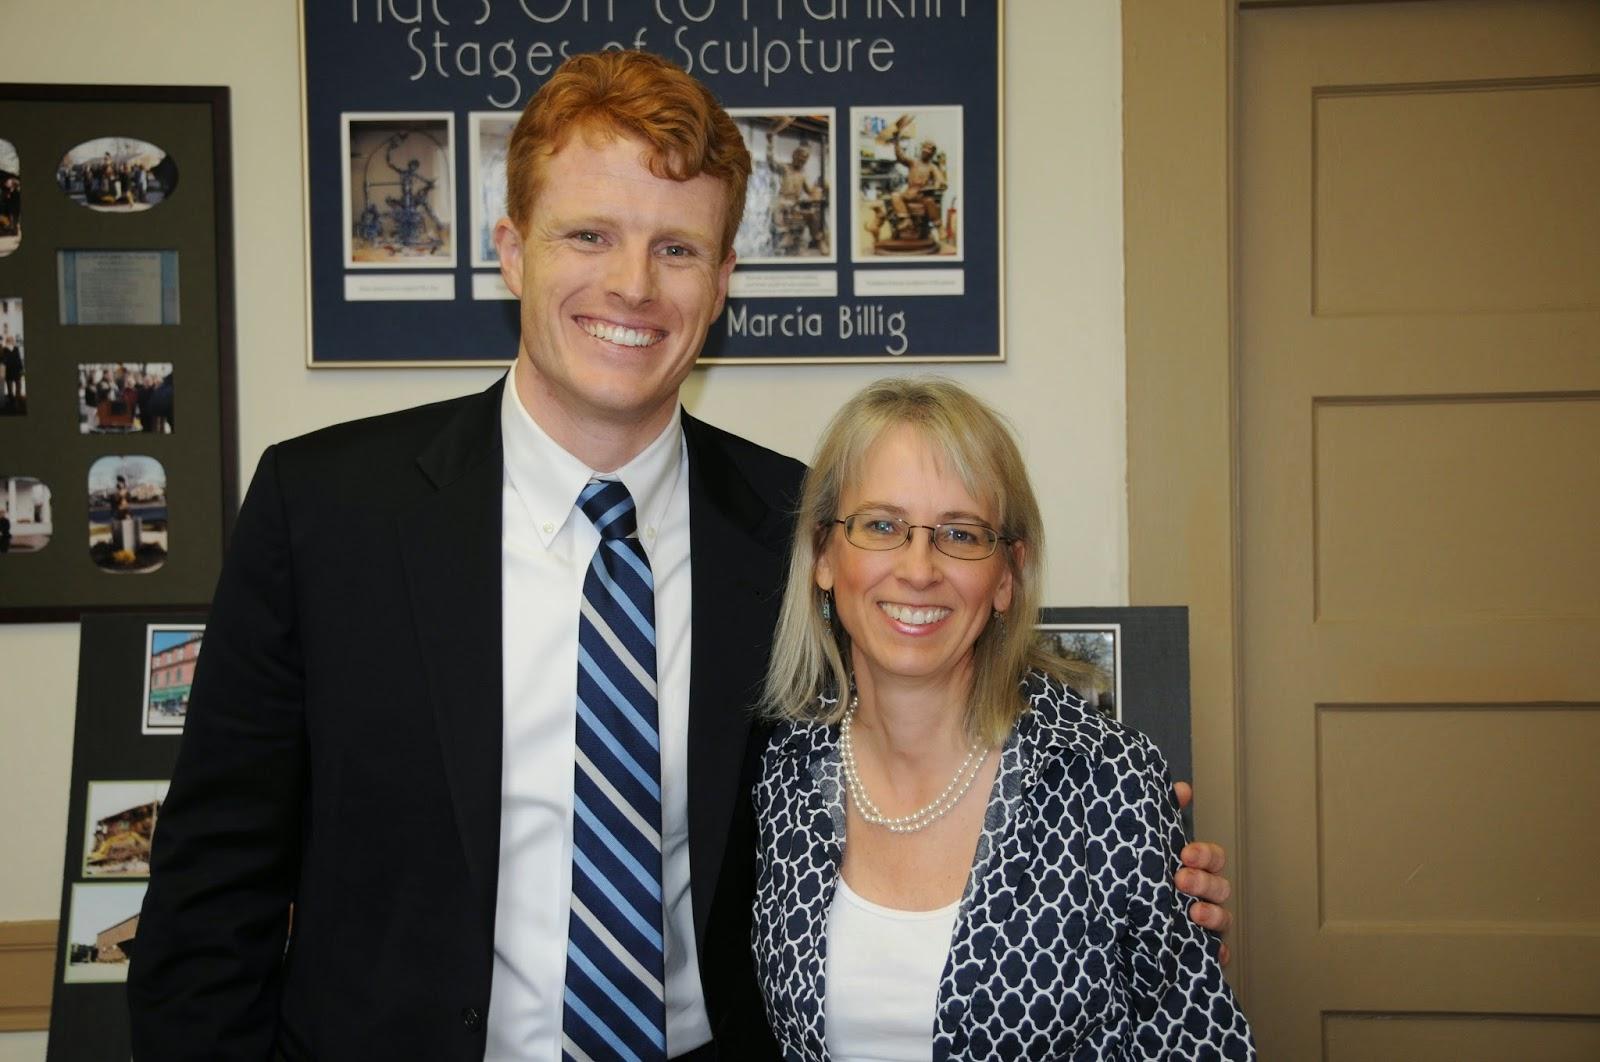 US Representative Joesph Kennedy III and FDP Executive Director Lisa Piana